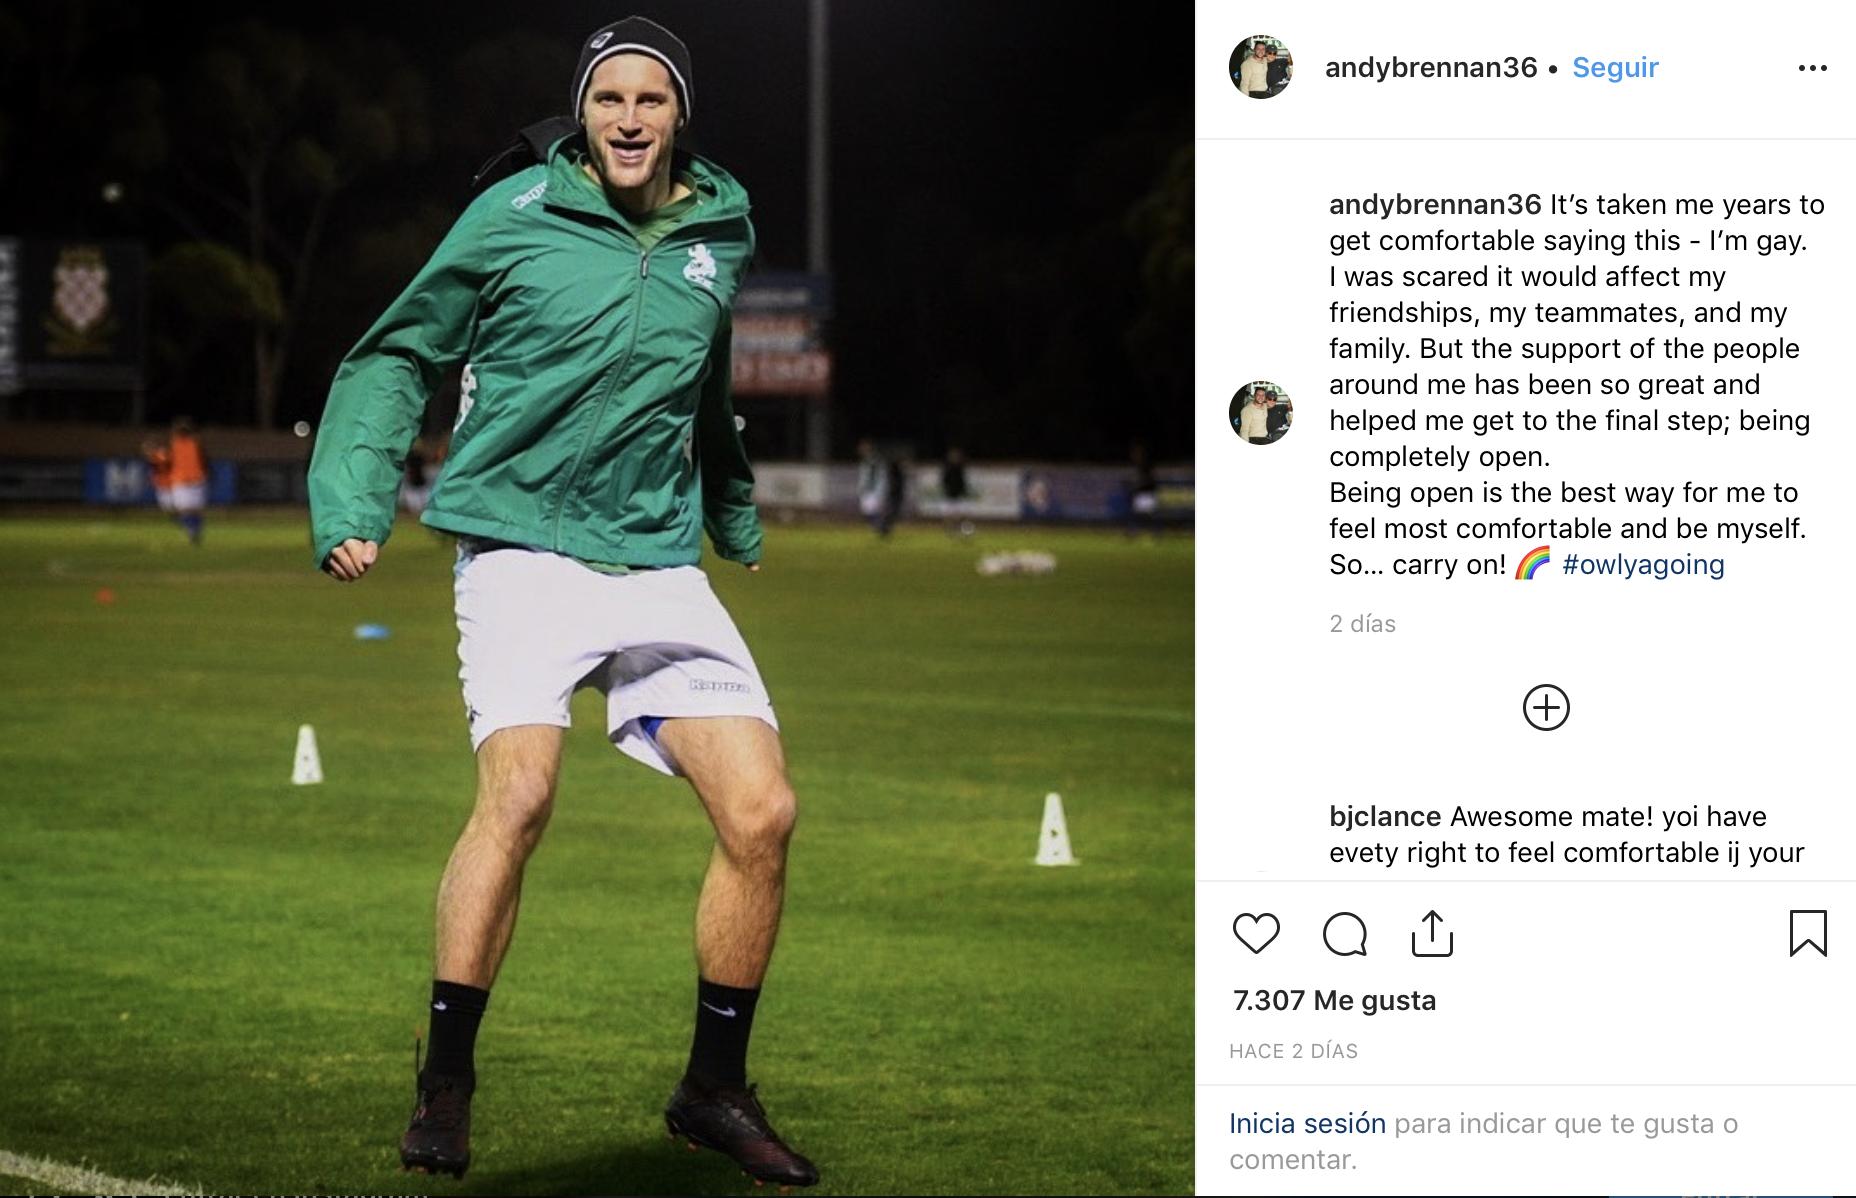 futbolista australiano gay